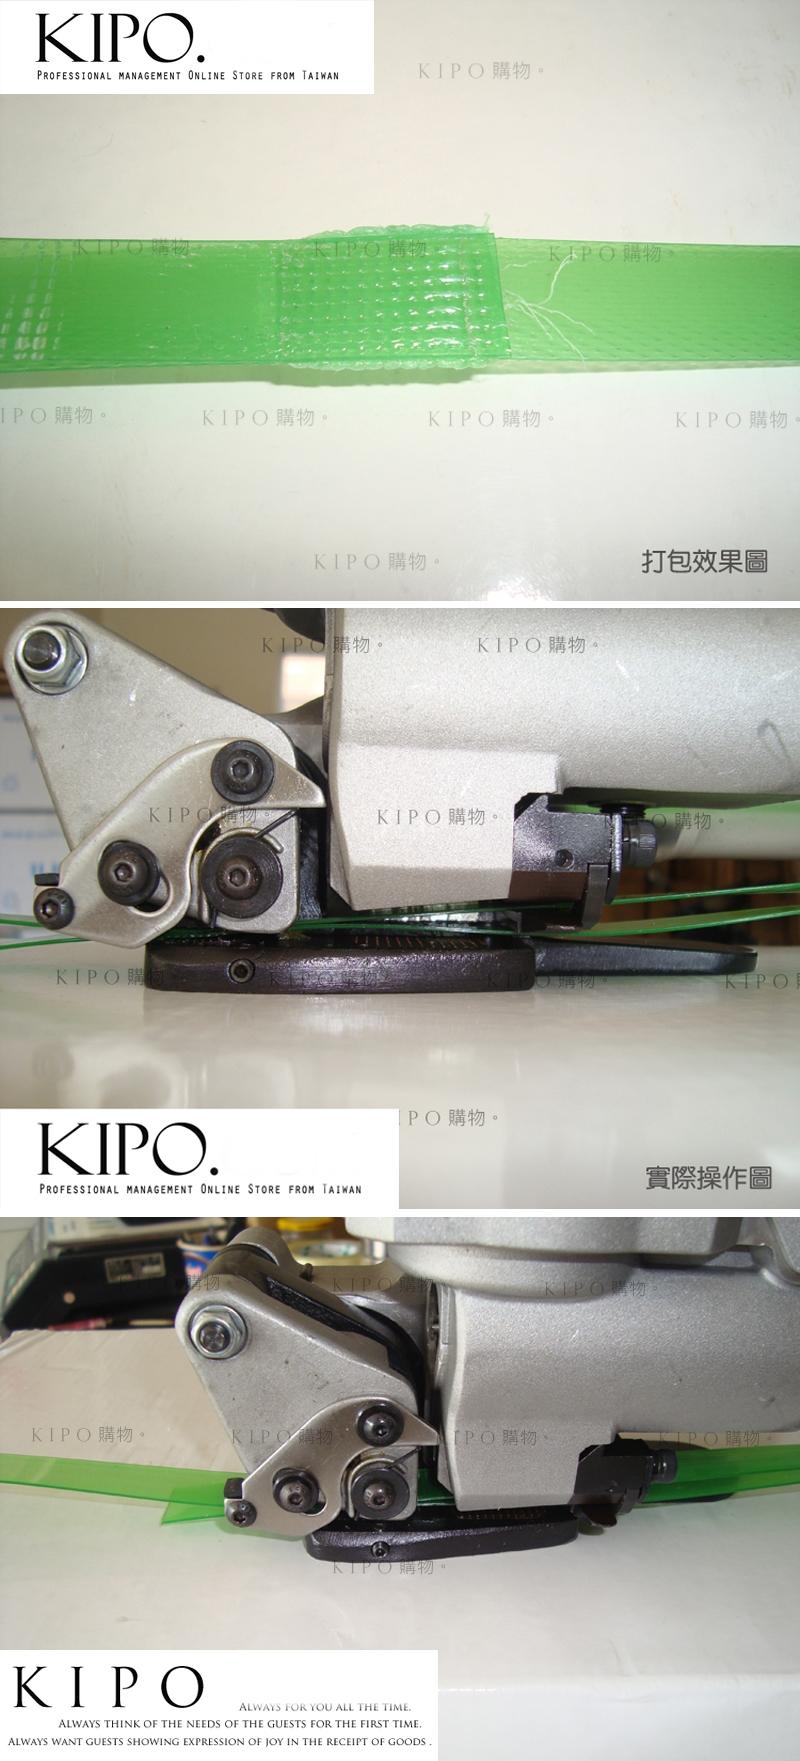 http://www.kipo.com.tw/EDM/buyimage/VIA001001A/p5.jpg